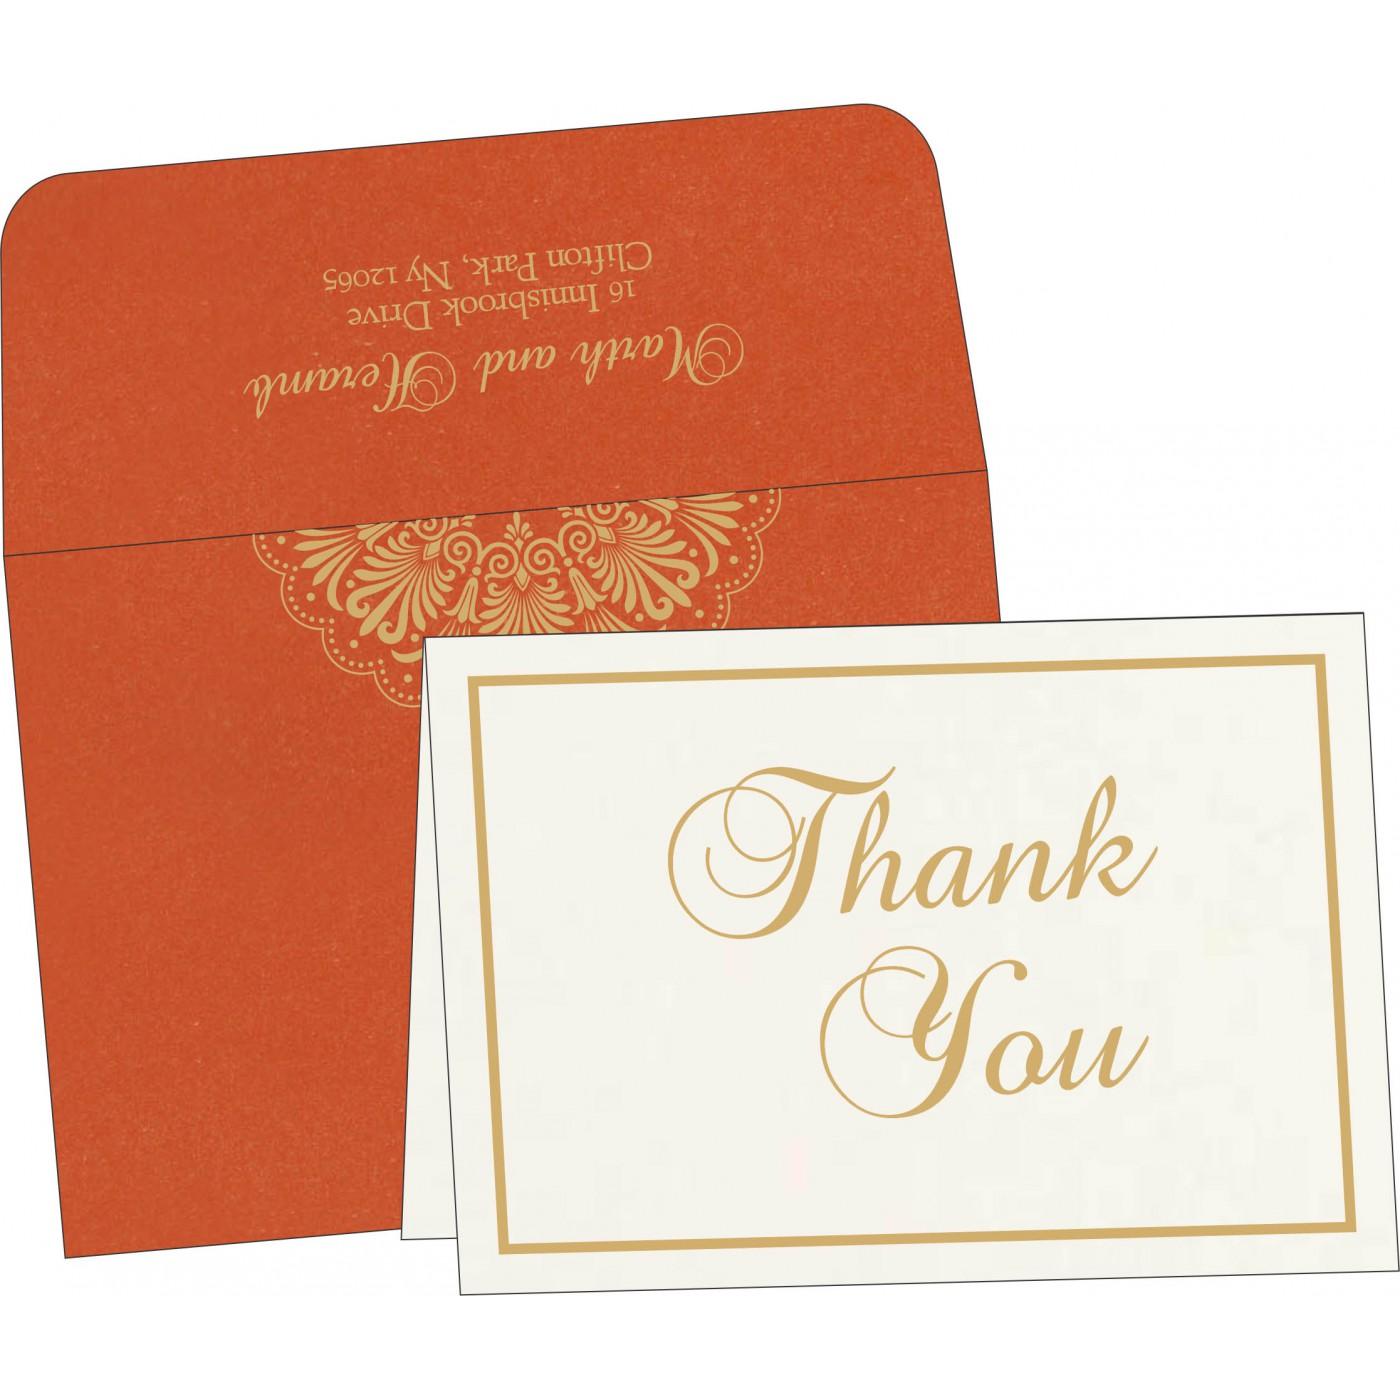 Thank You Cards : TYC-8238F - 123WeddingCards